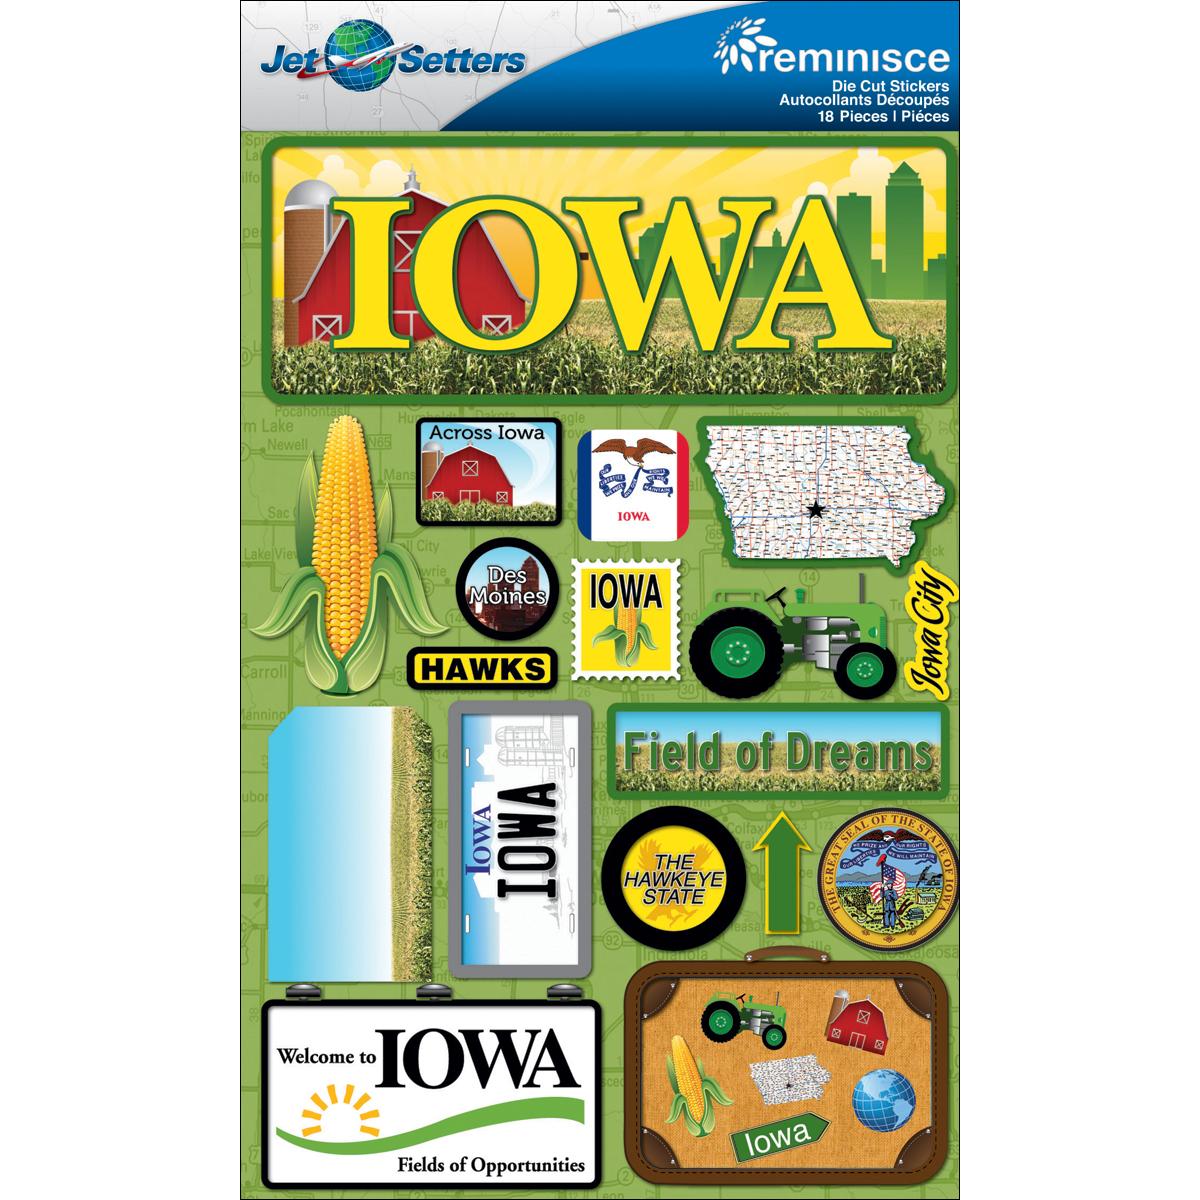 Iowa - Reminisce Jet Setters State Dimensional Stickers